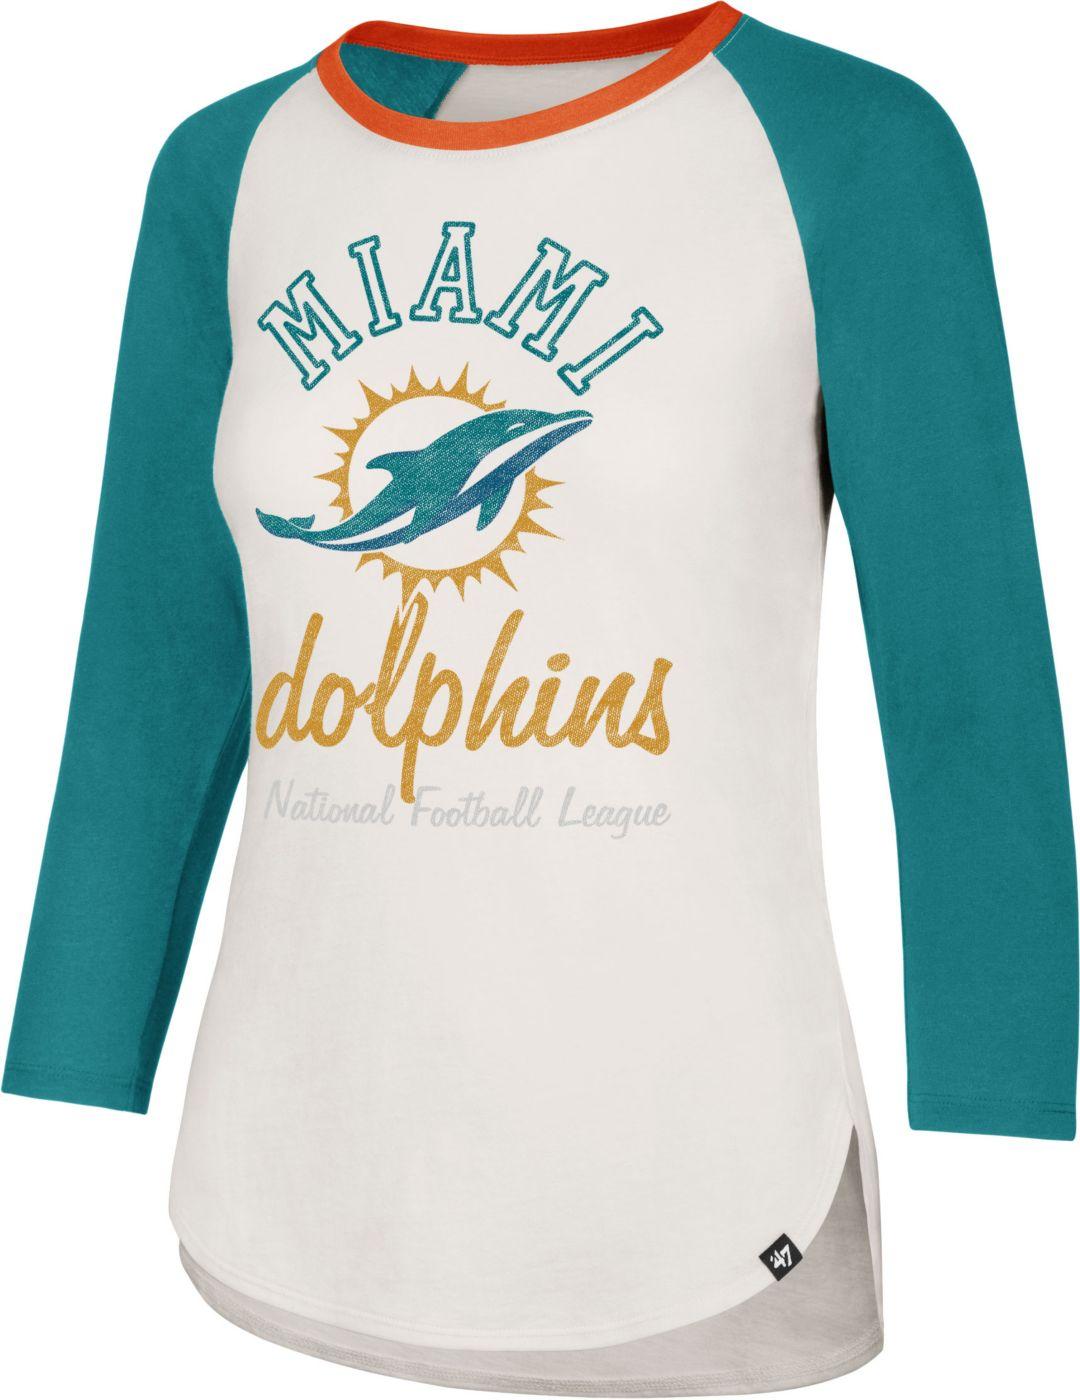 5bdc99f7 '47 Women's Miami Dolphins Raglan Shirt